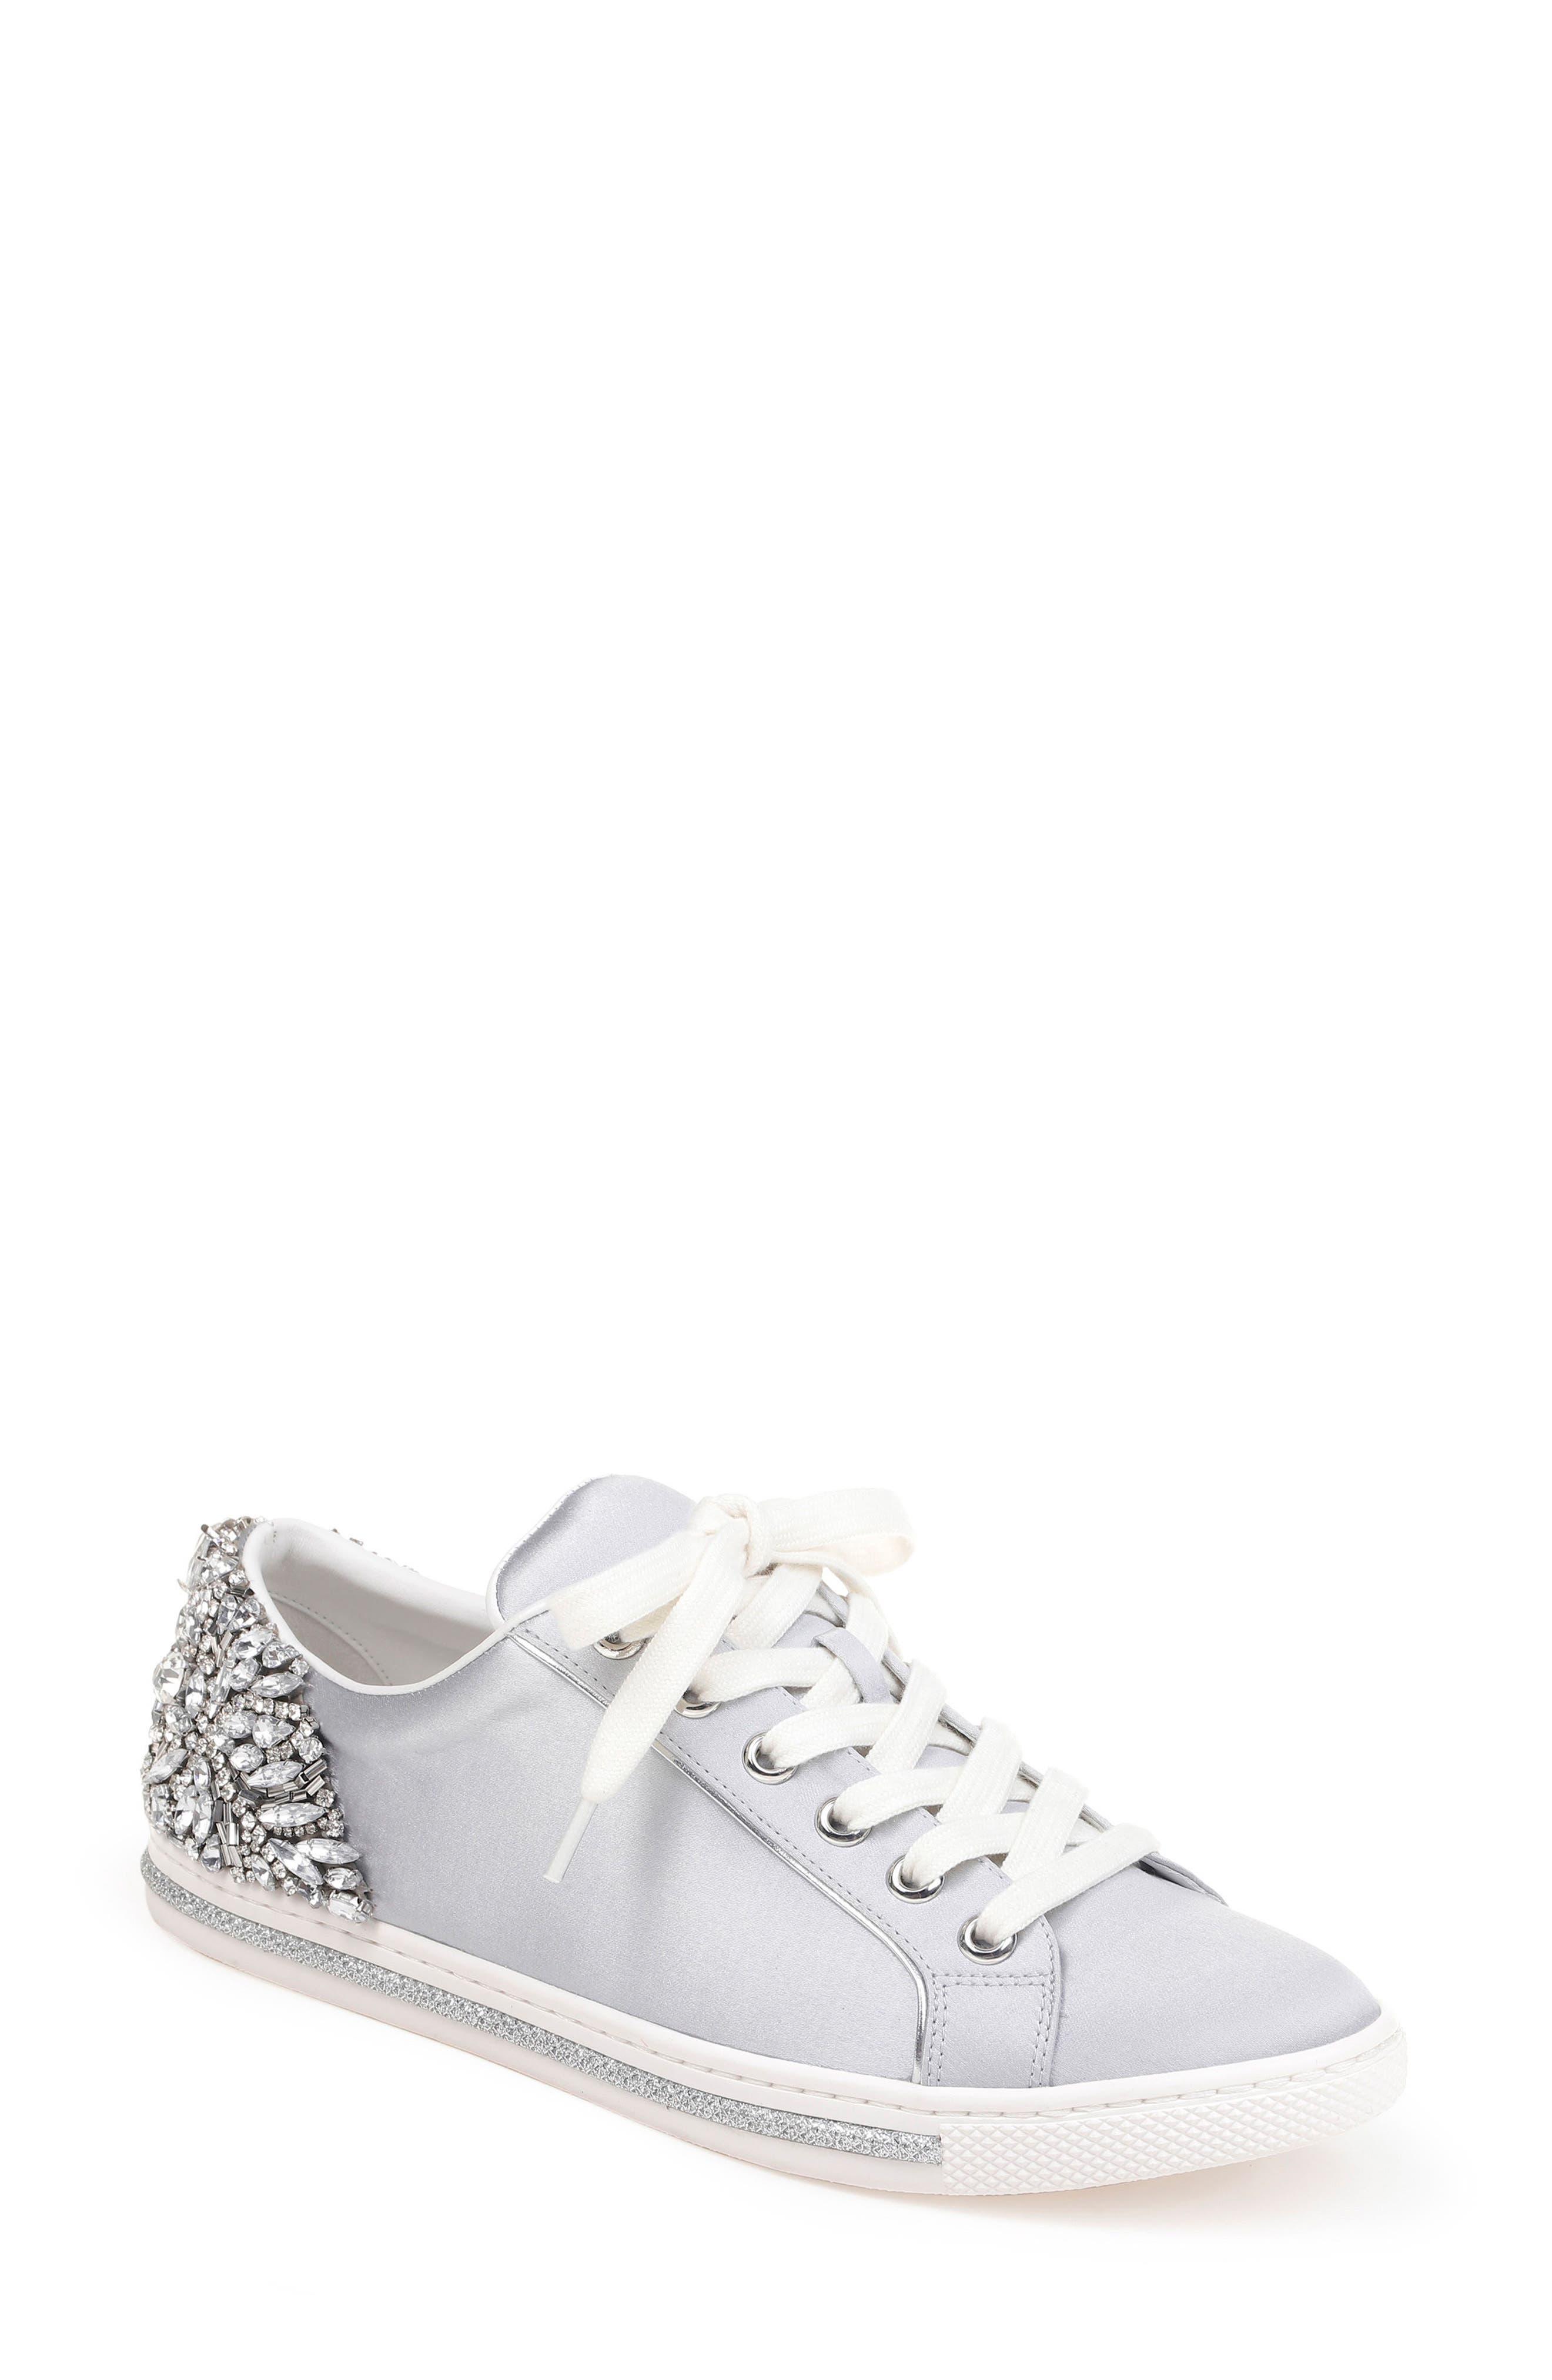 Badgley Mischka Shirley Crystal Embellished Sneaker,                         Main,                         color, 045